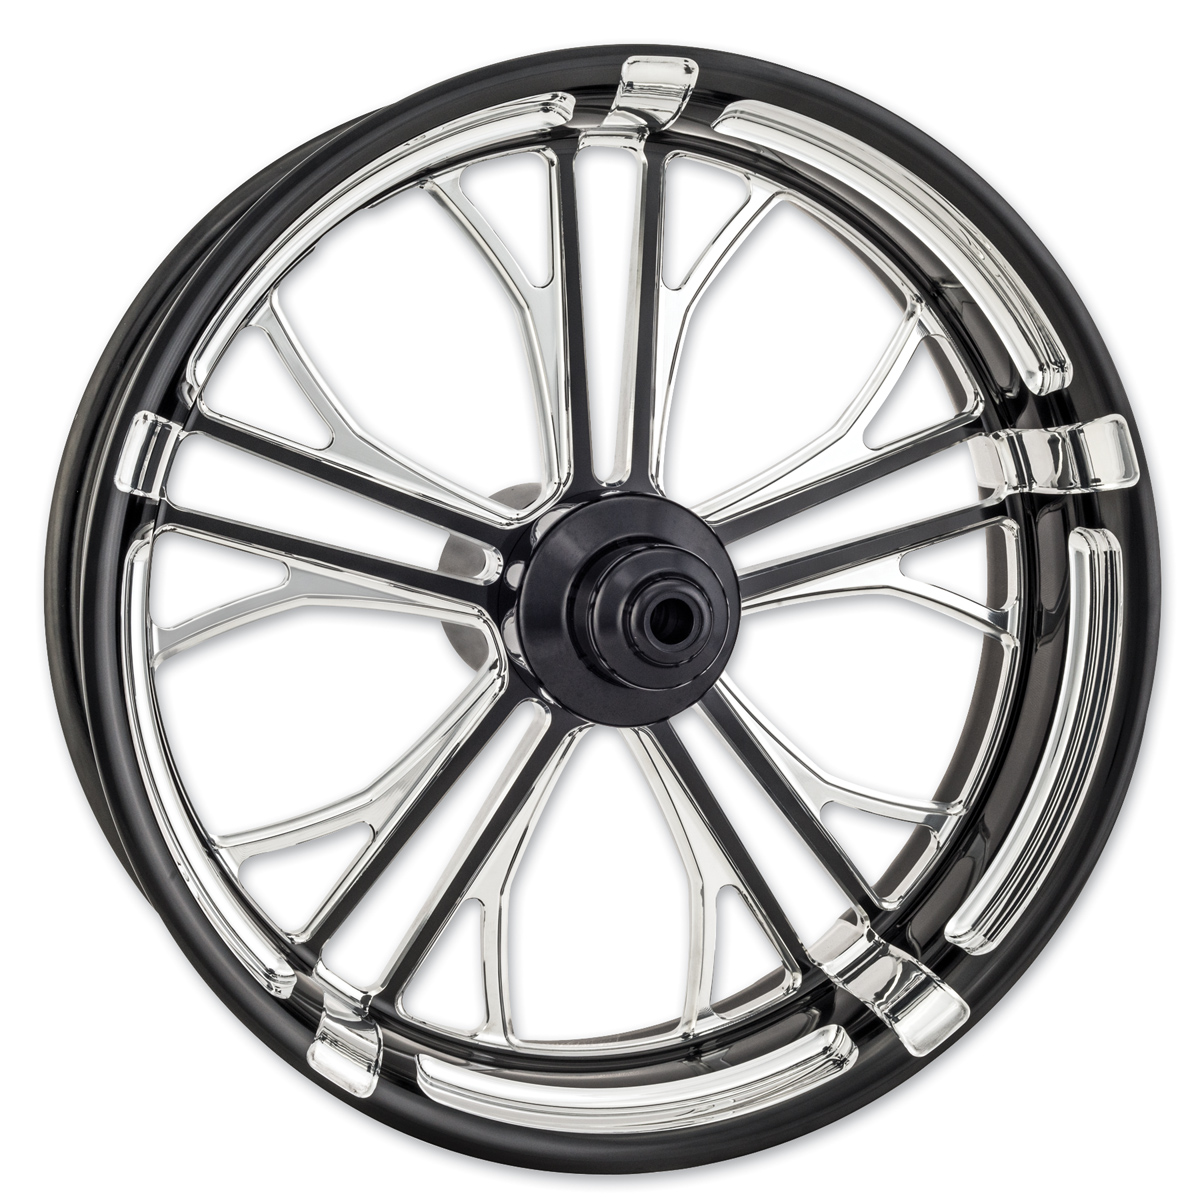 Performance Machine Dixon Platinum Cut Rear Wheel 17x6